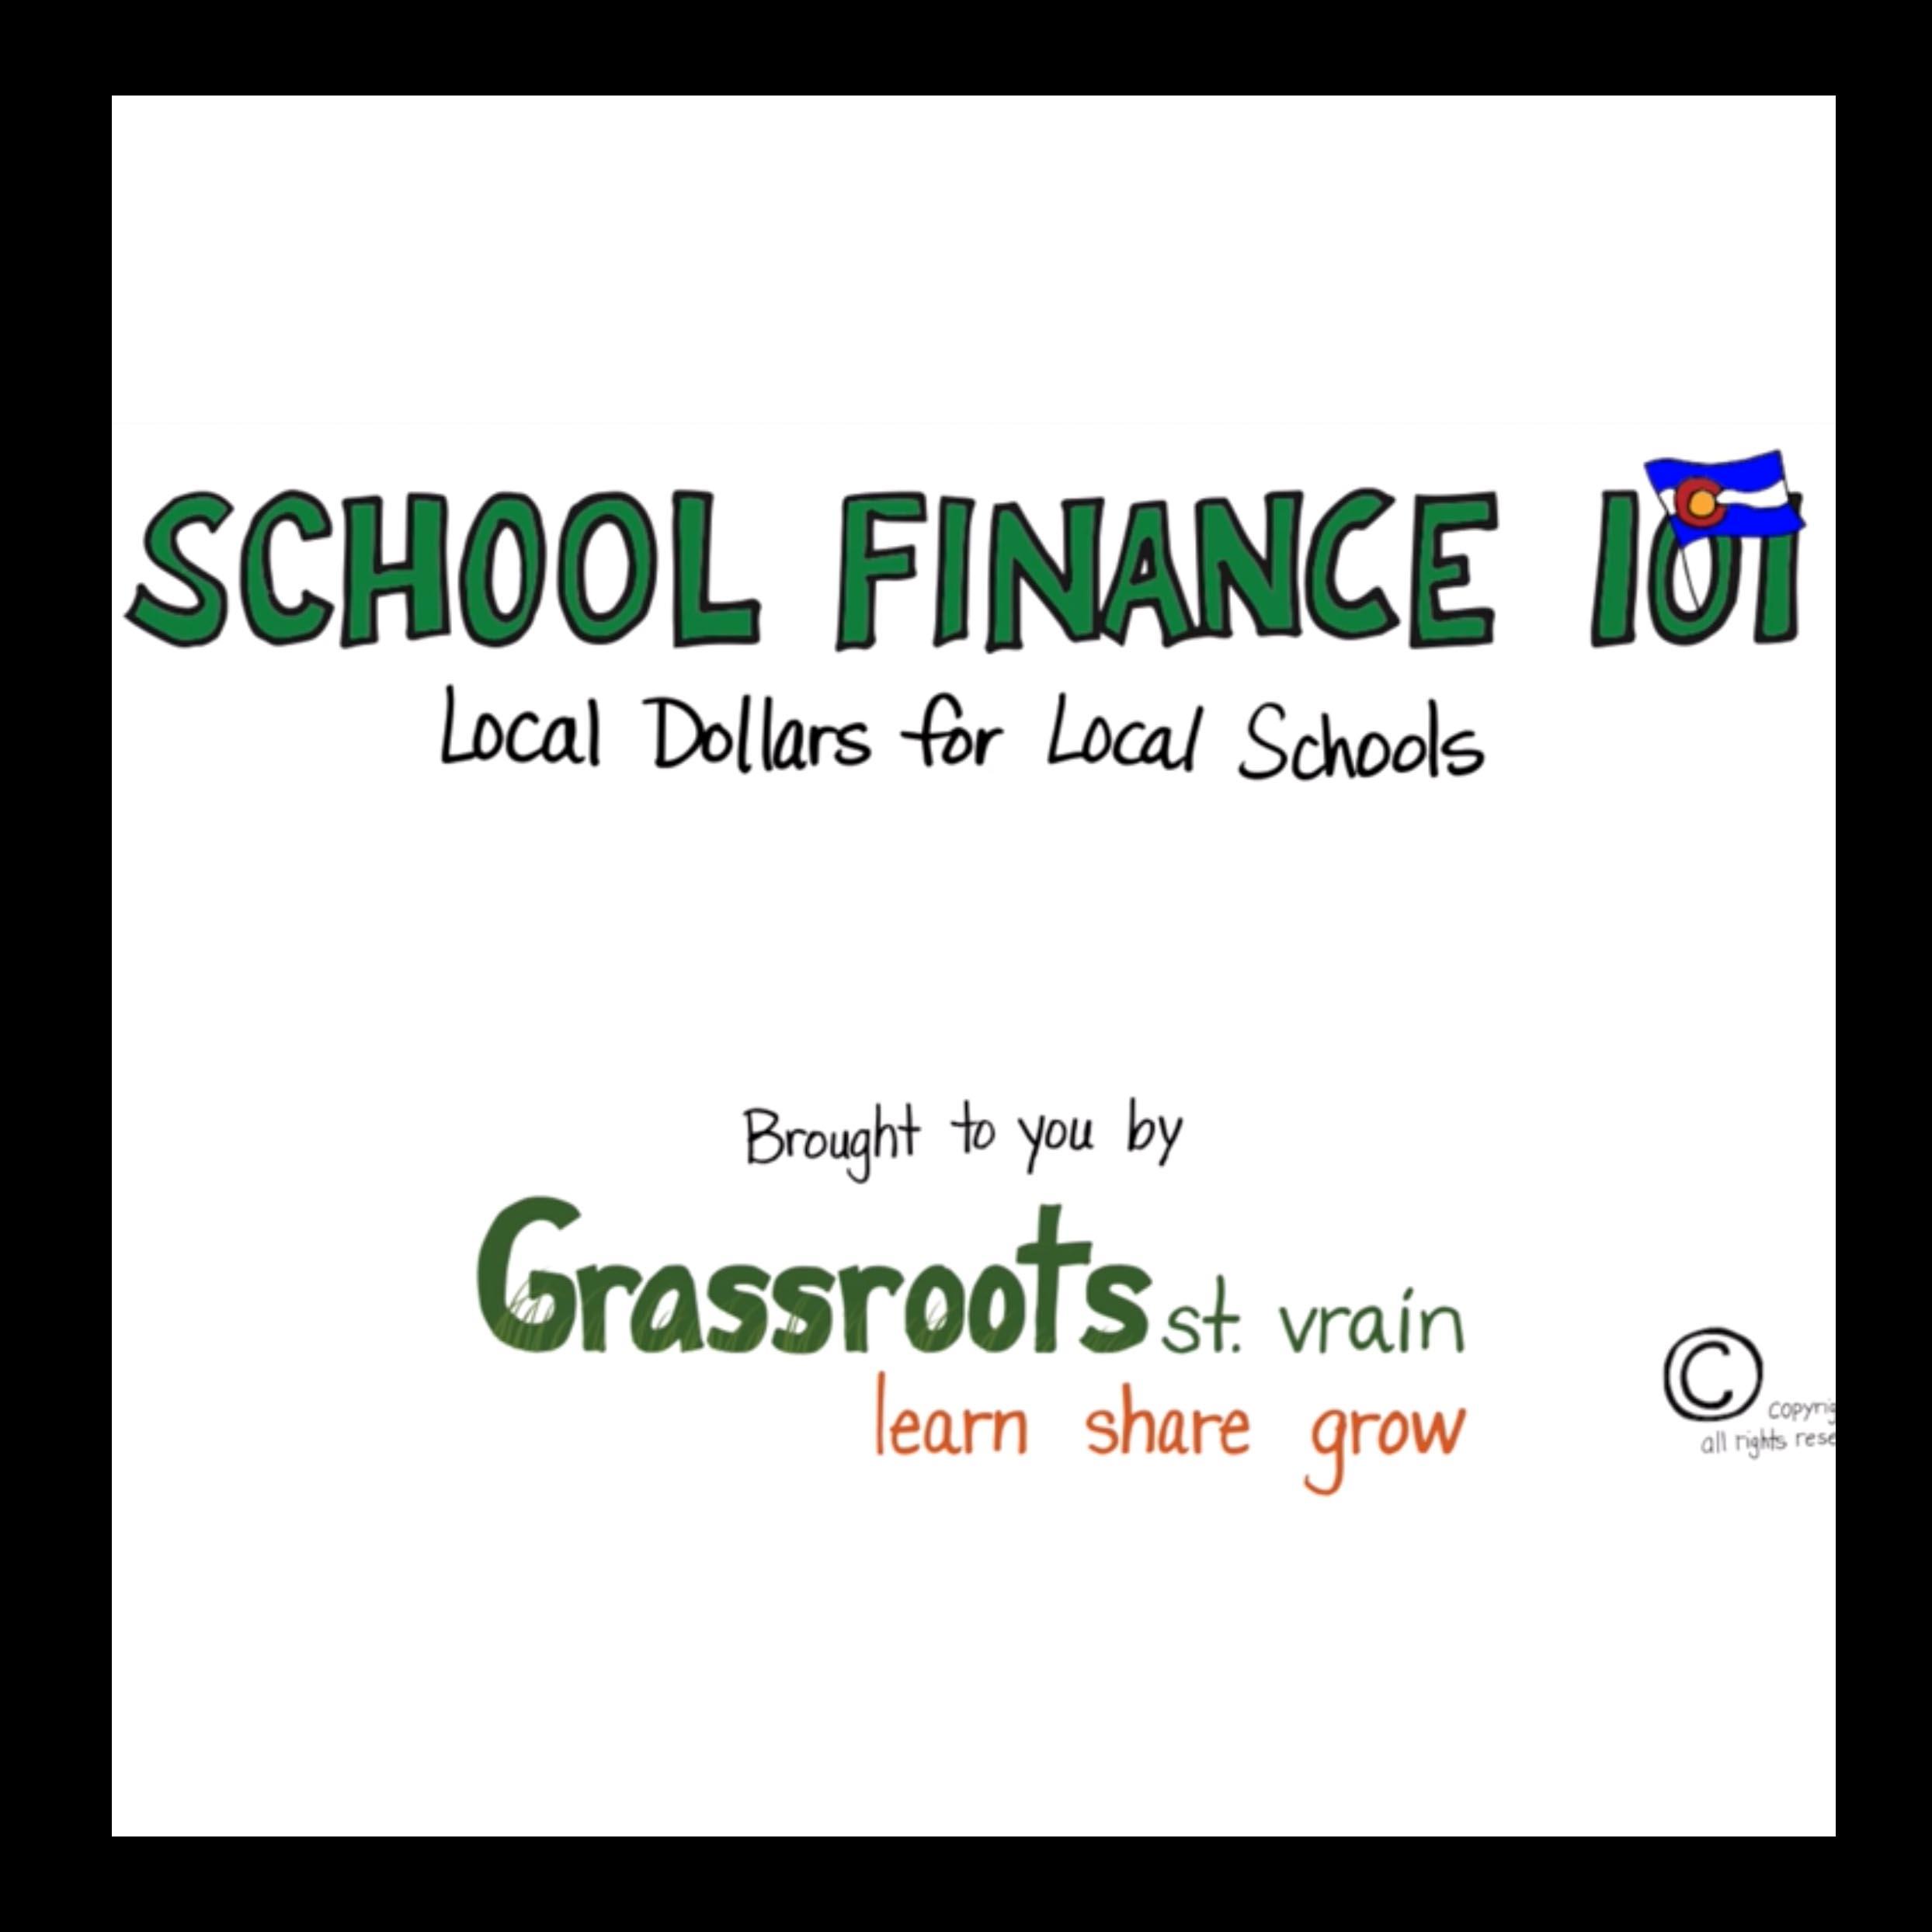 finance101localdollars.jpg